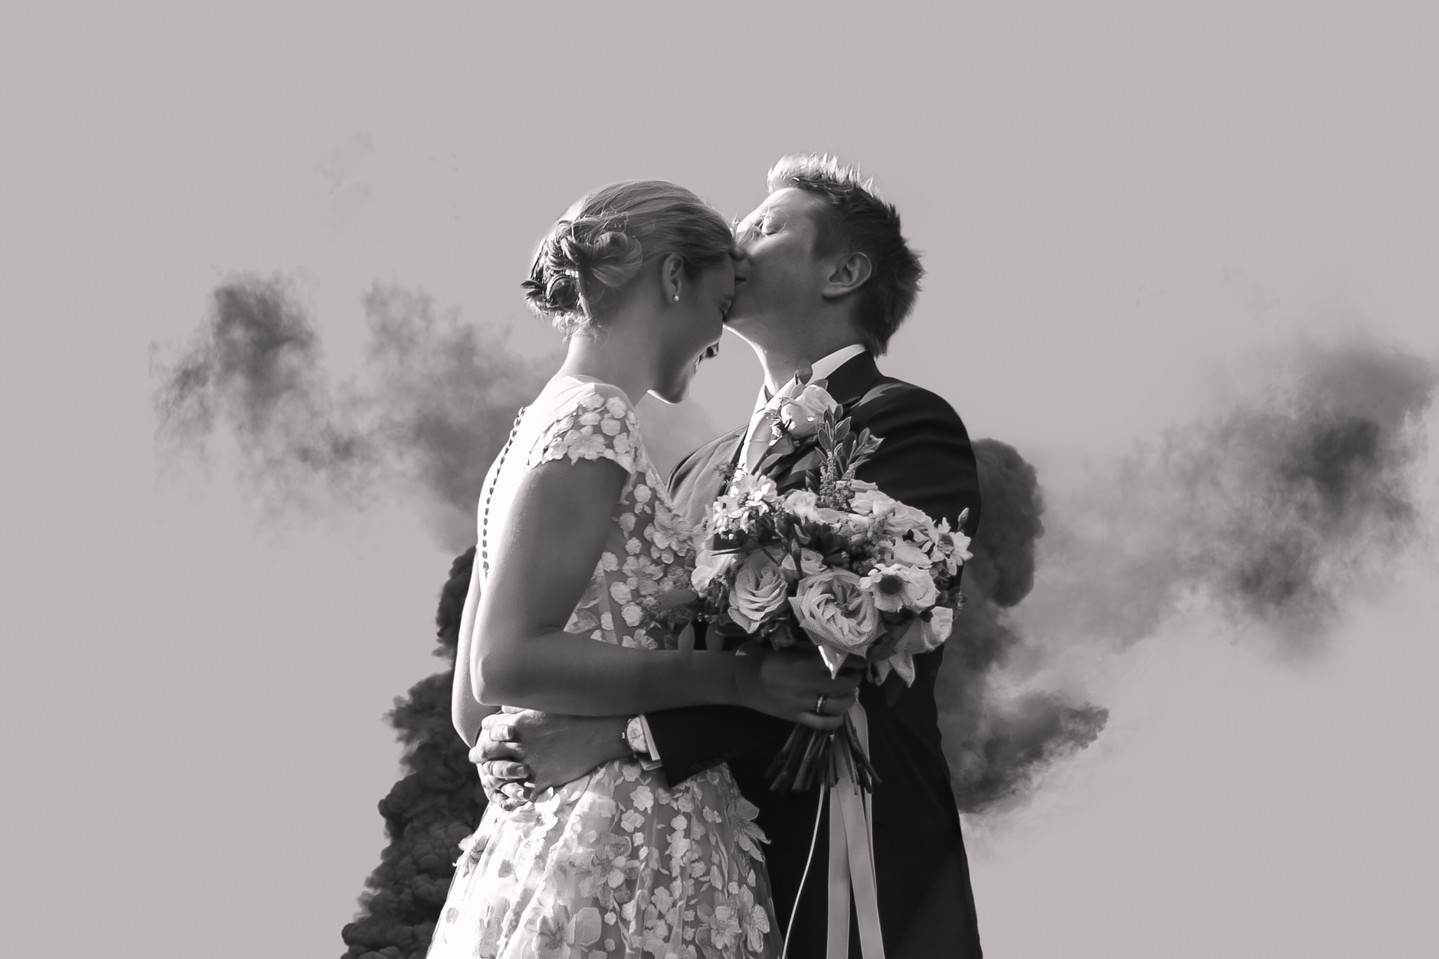 Nick + Elizabeth - Smoke Bomb.jpg